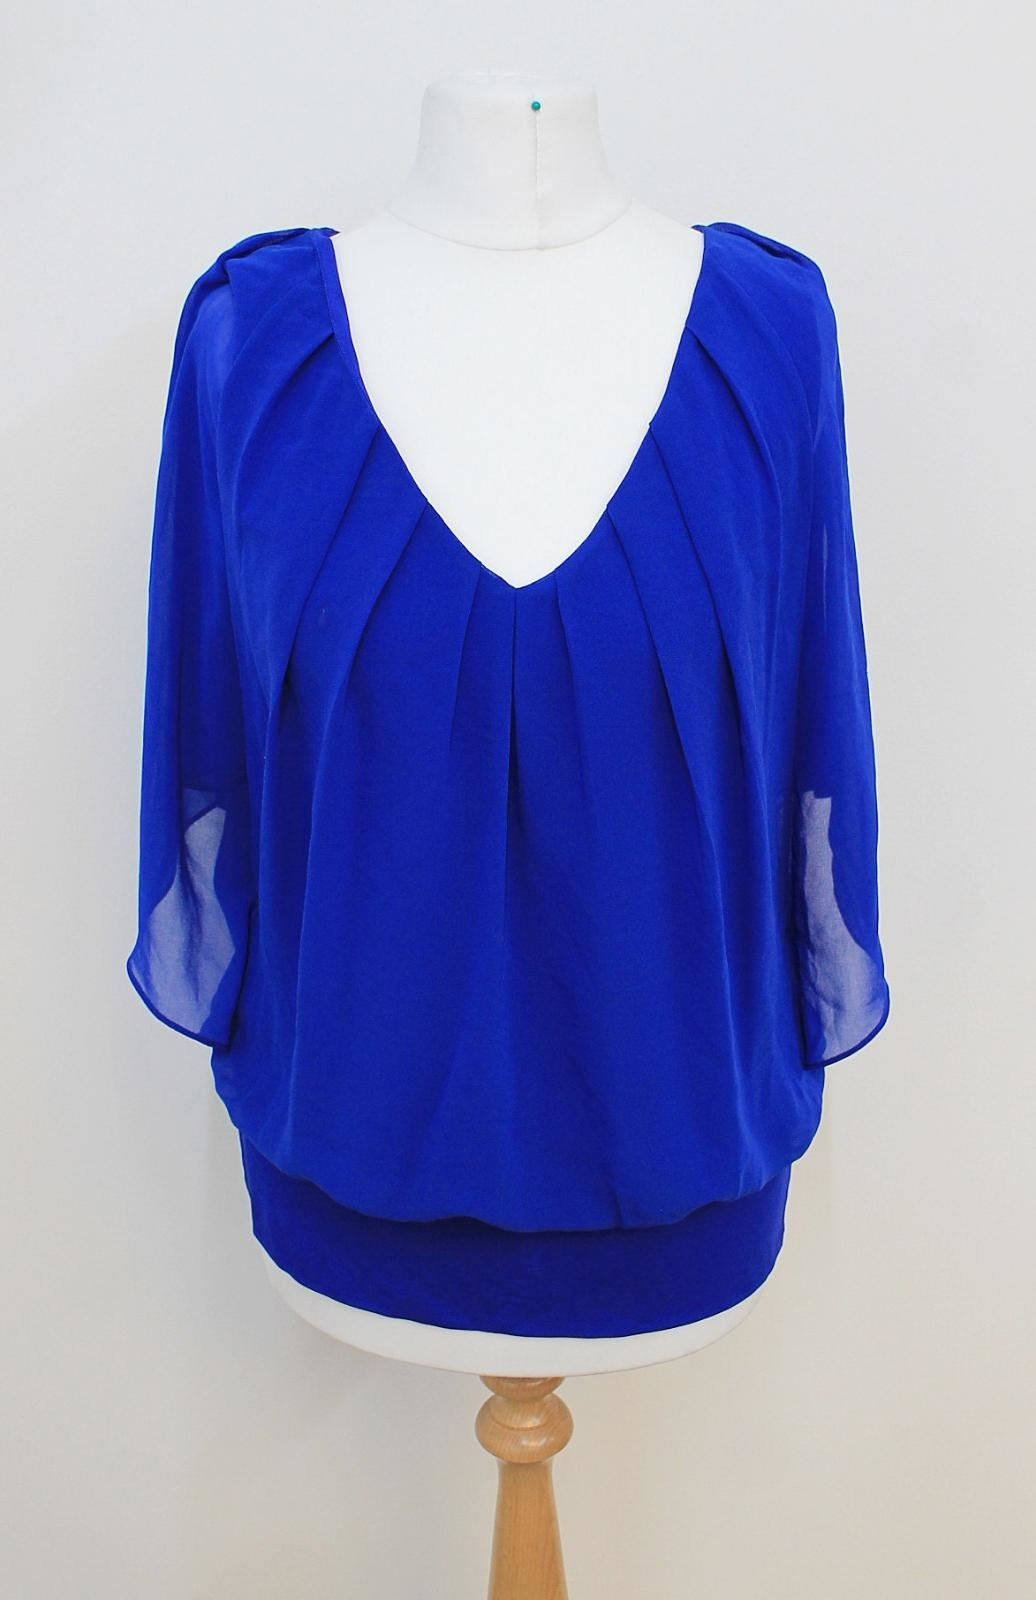 COAST Ladies Navy Blau V Neckline Batwing Sleeved Stretchy Blouse Größe UK10